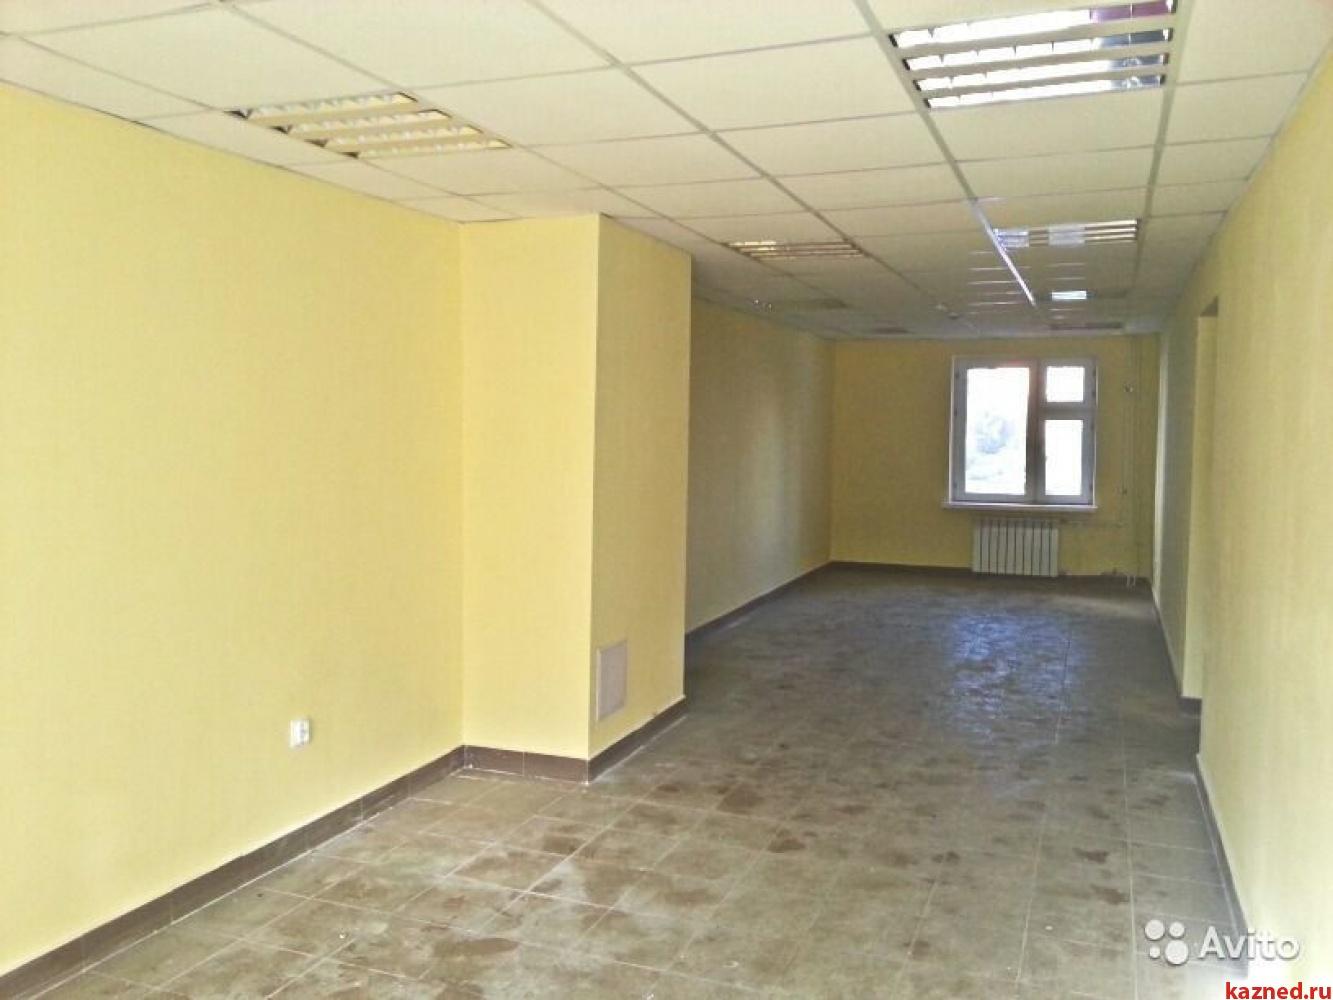 Продажа  помещения свободного назначения Академика Сахарова, 10, 74 м2  (миниатюра №3)